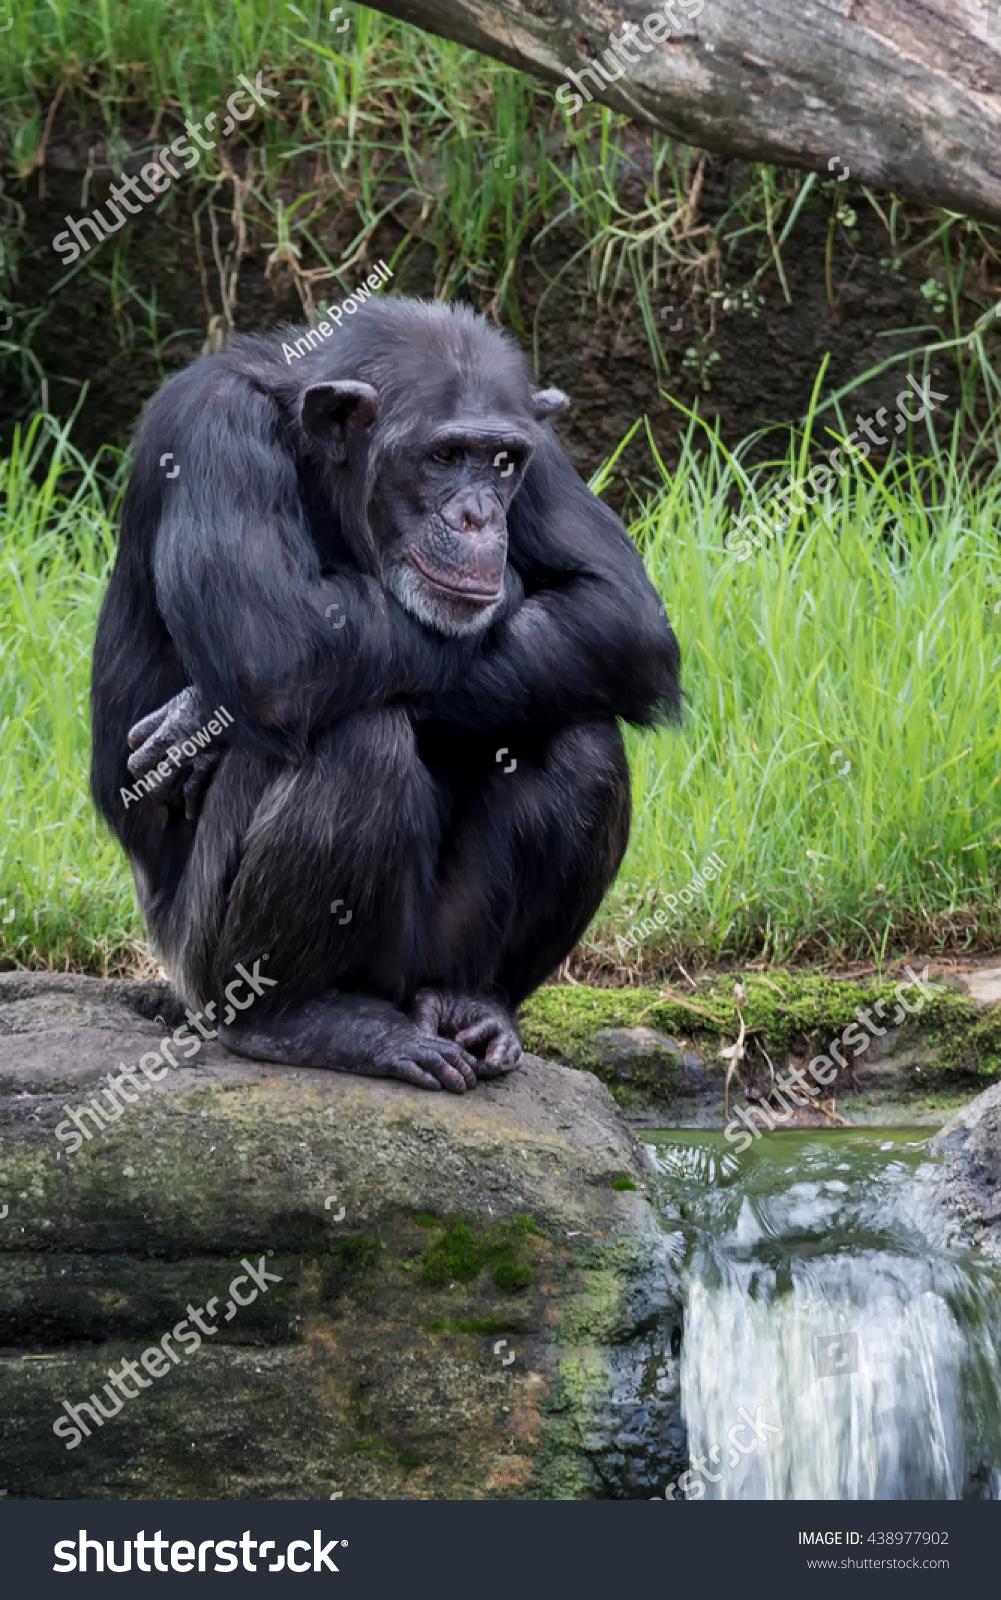 Chimpanzee stock image. Image of animal, intelegent, black ...  |Chimp Sitting